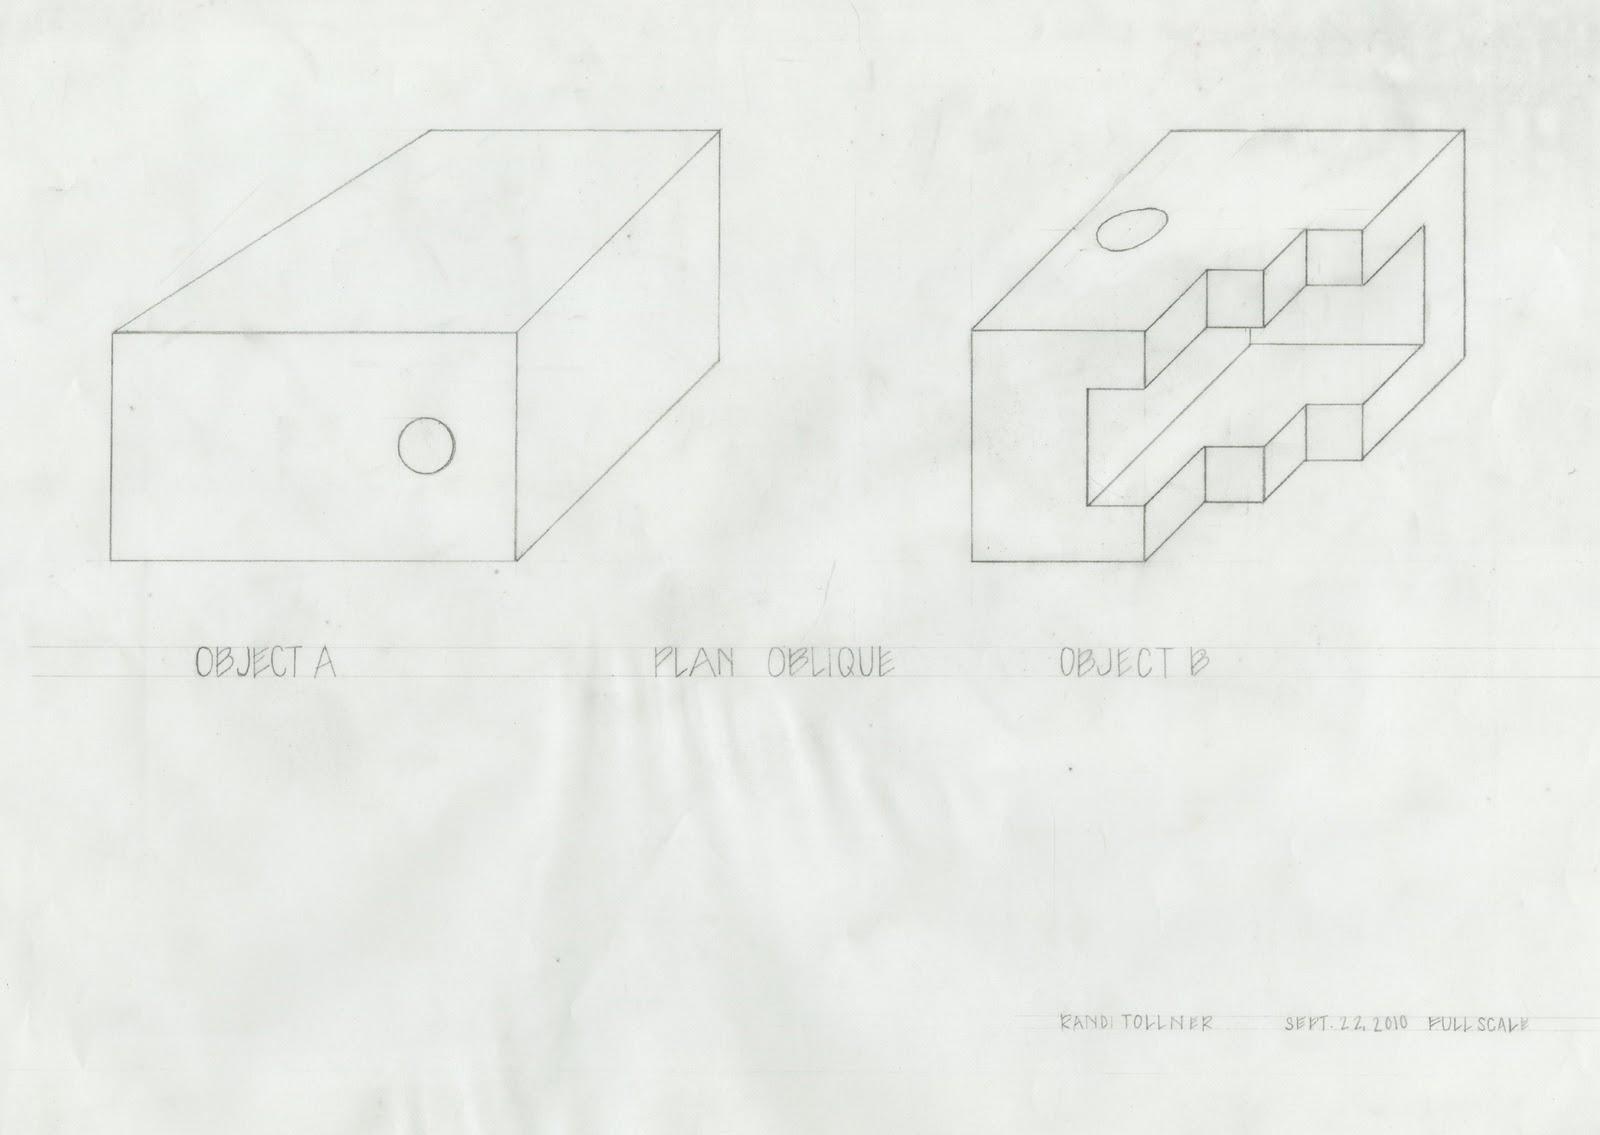 Plan Elevation Oblique : Randi tollner plan oblique and isometric